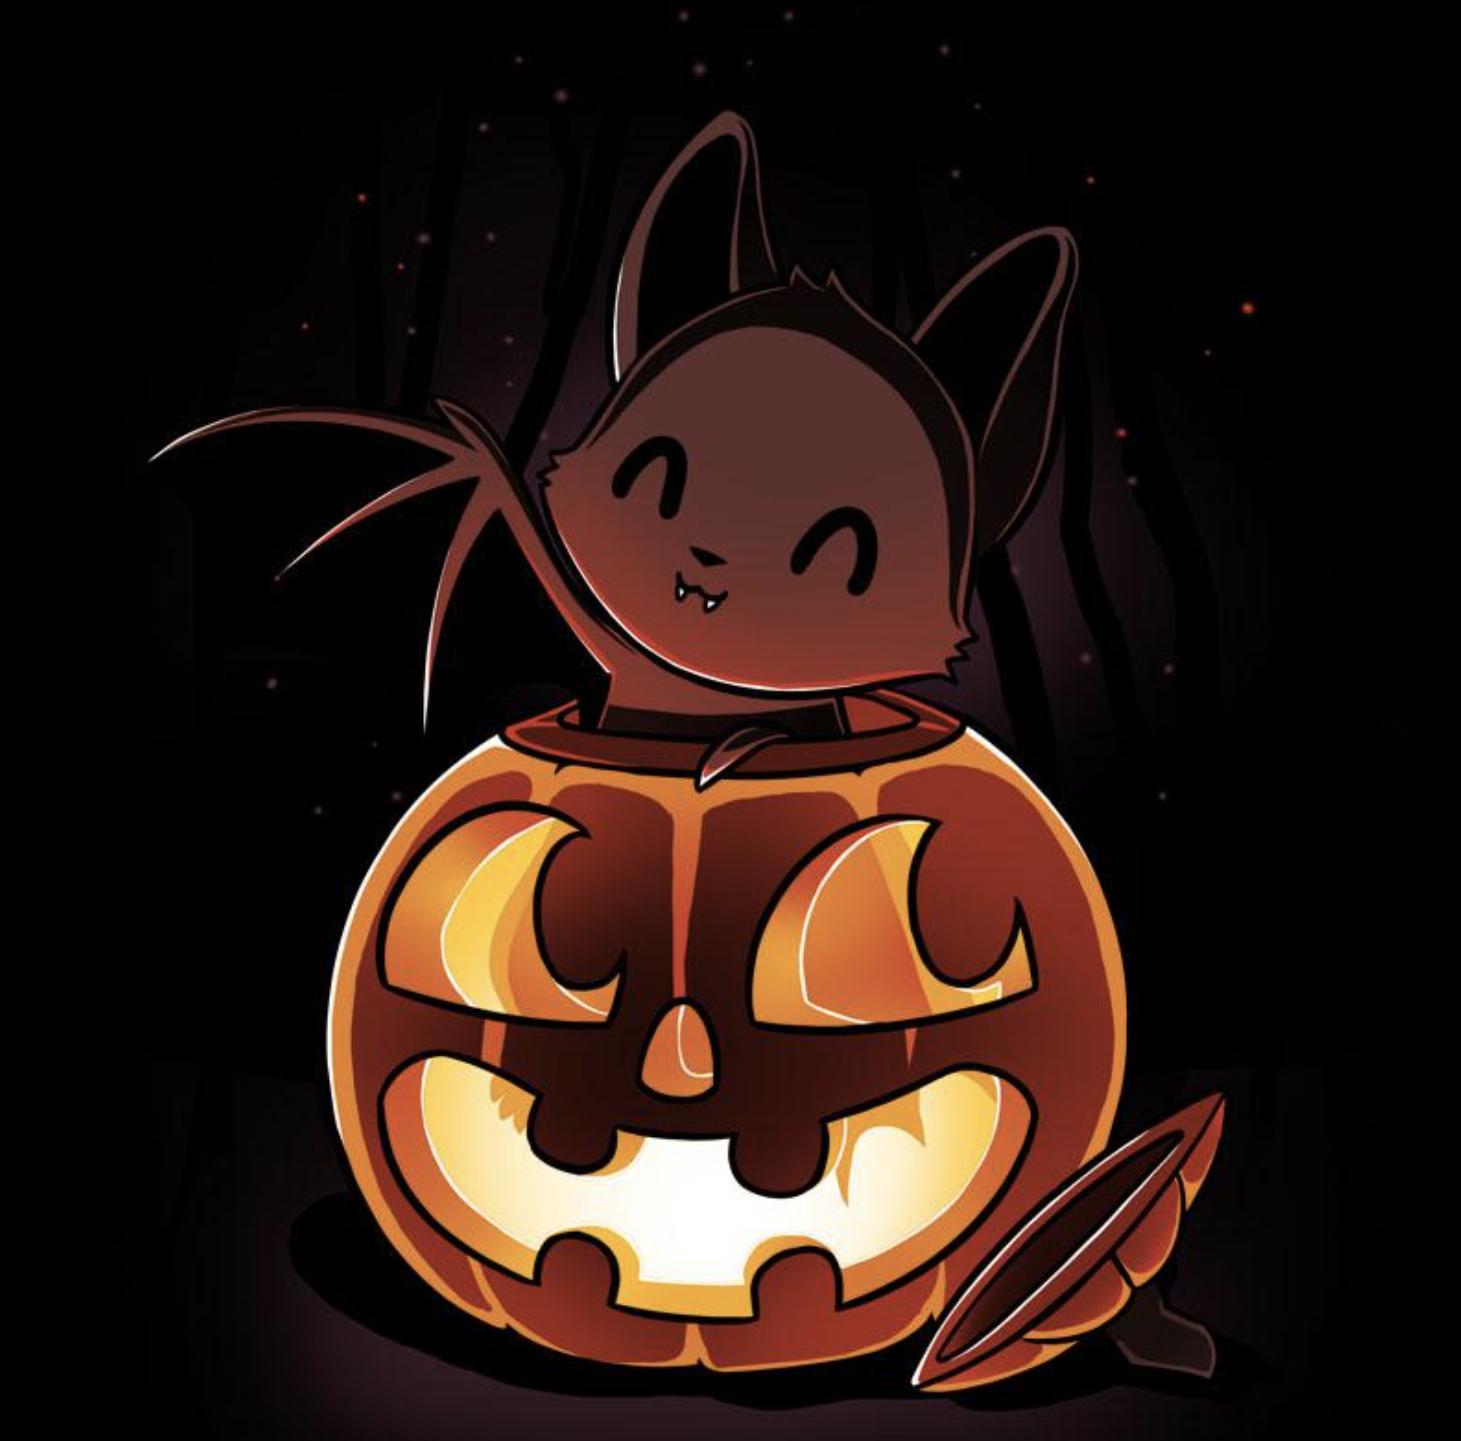 Pin by Kassidy Nickey on teeturtle Halloween drawings